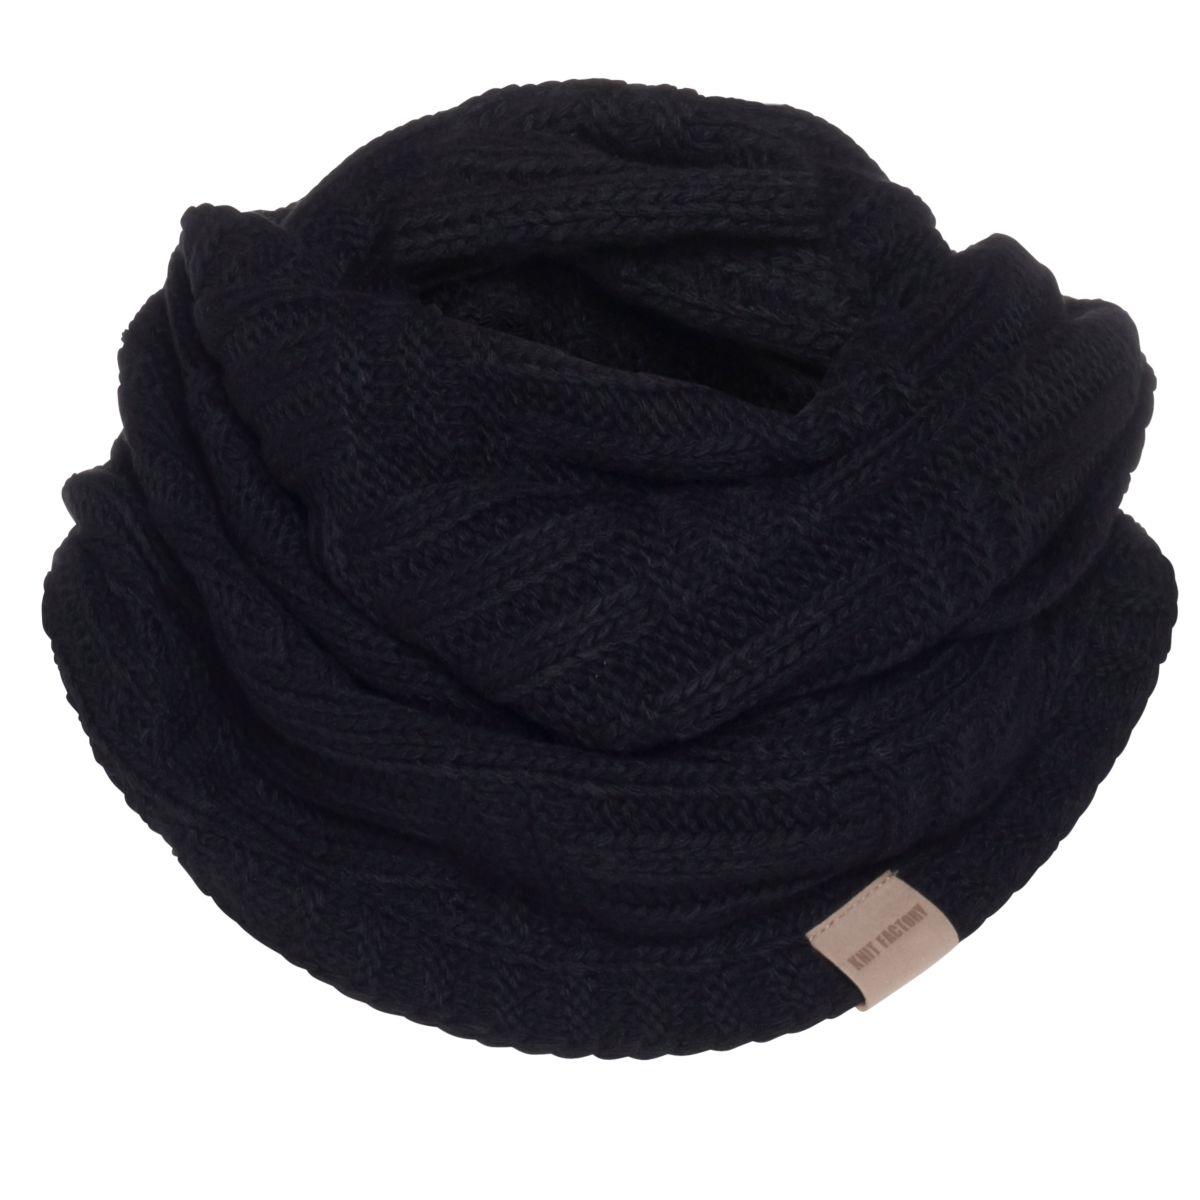 bobby infinity scarf black